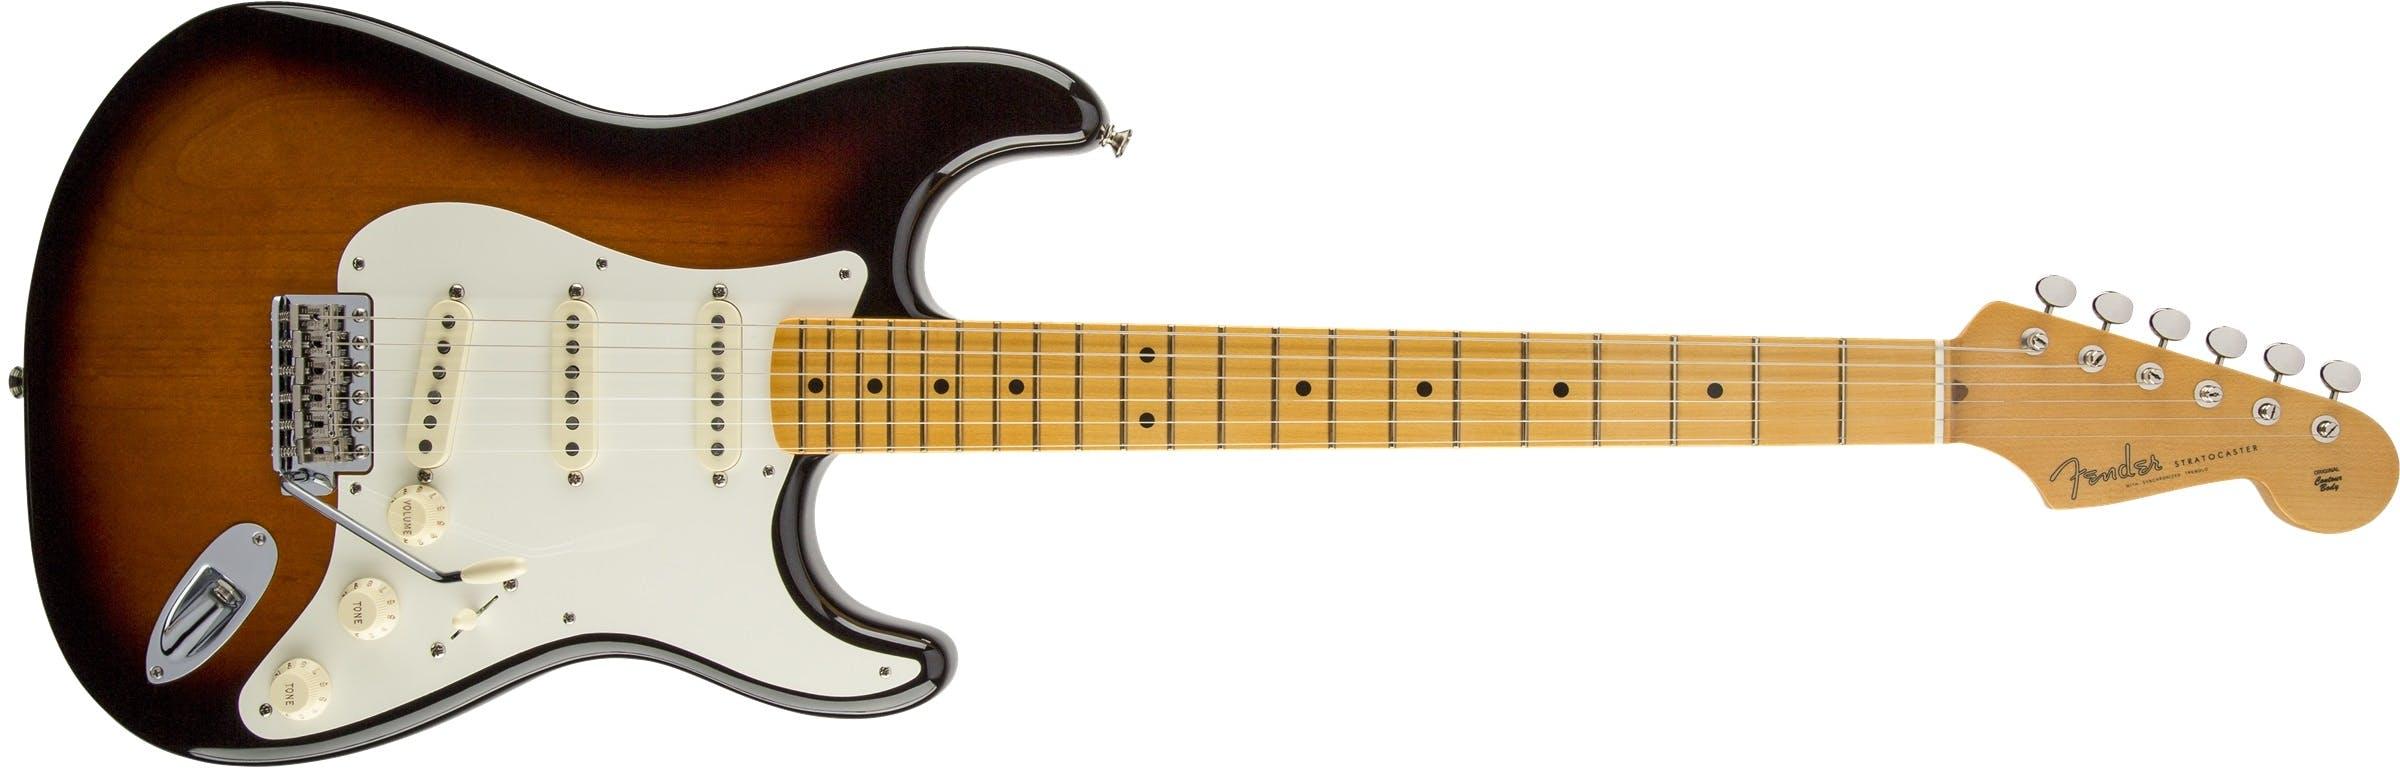 Eric Johnson Strat Wiring Page 1 Love Schematic Diagrams Fender Stratocaster Diagram In 2 Colour Sunburst Maple